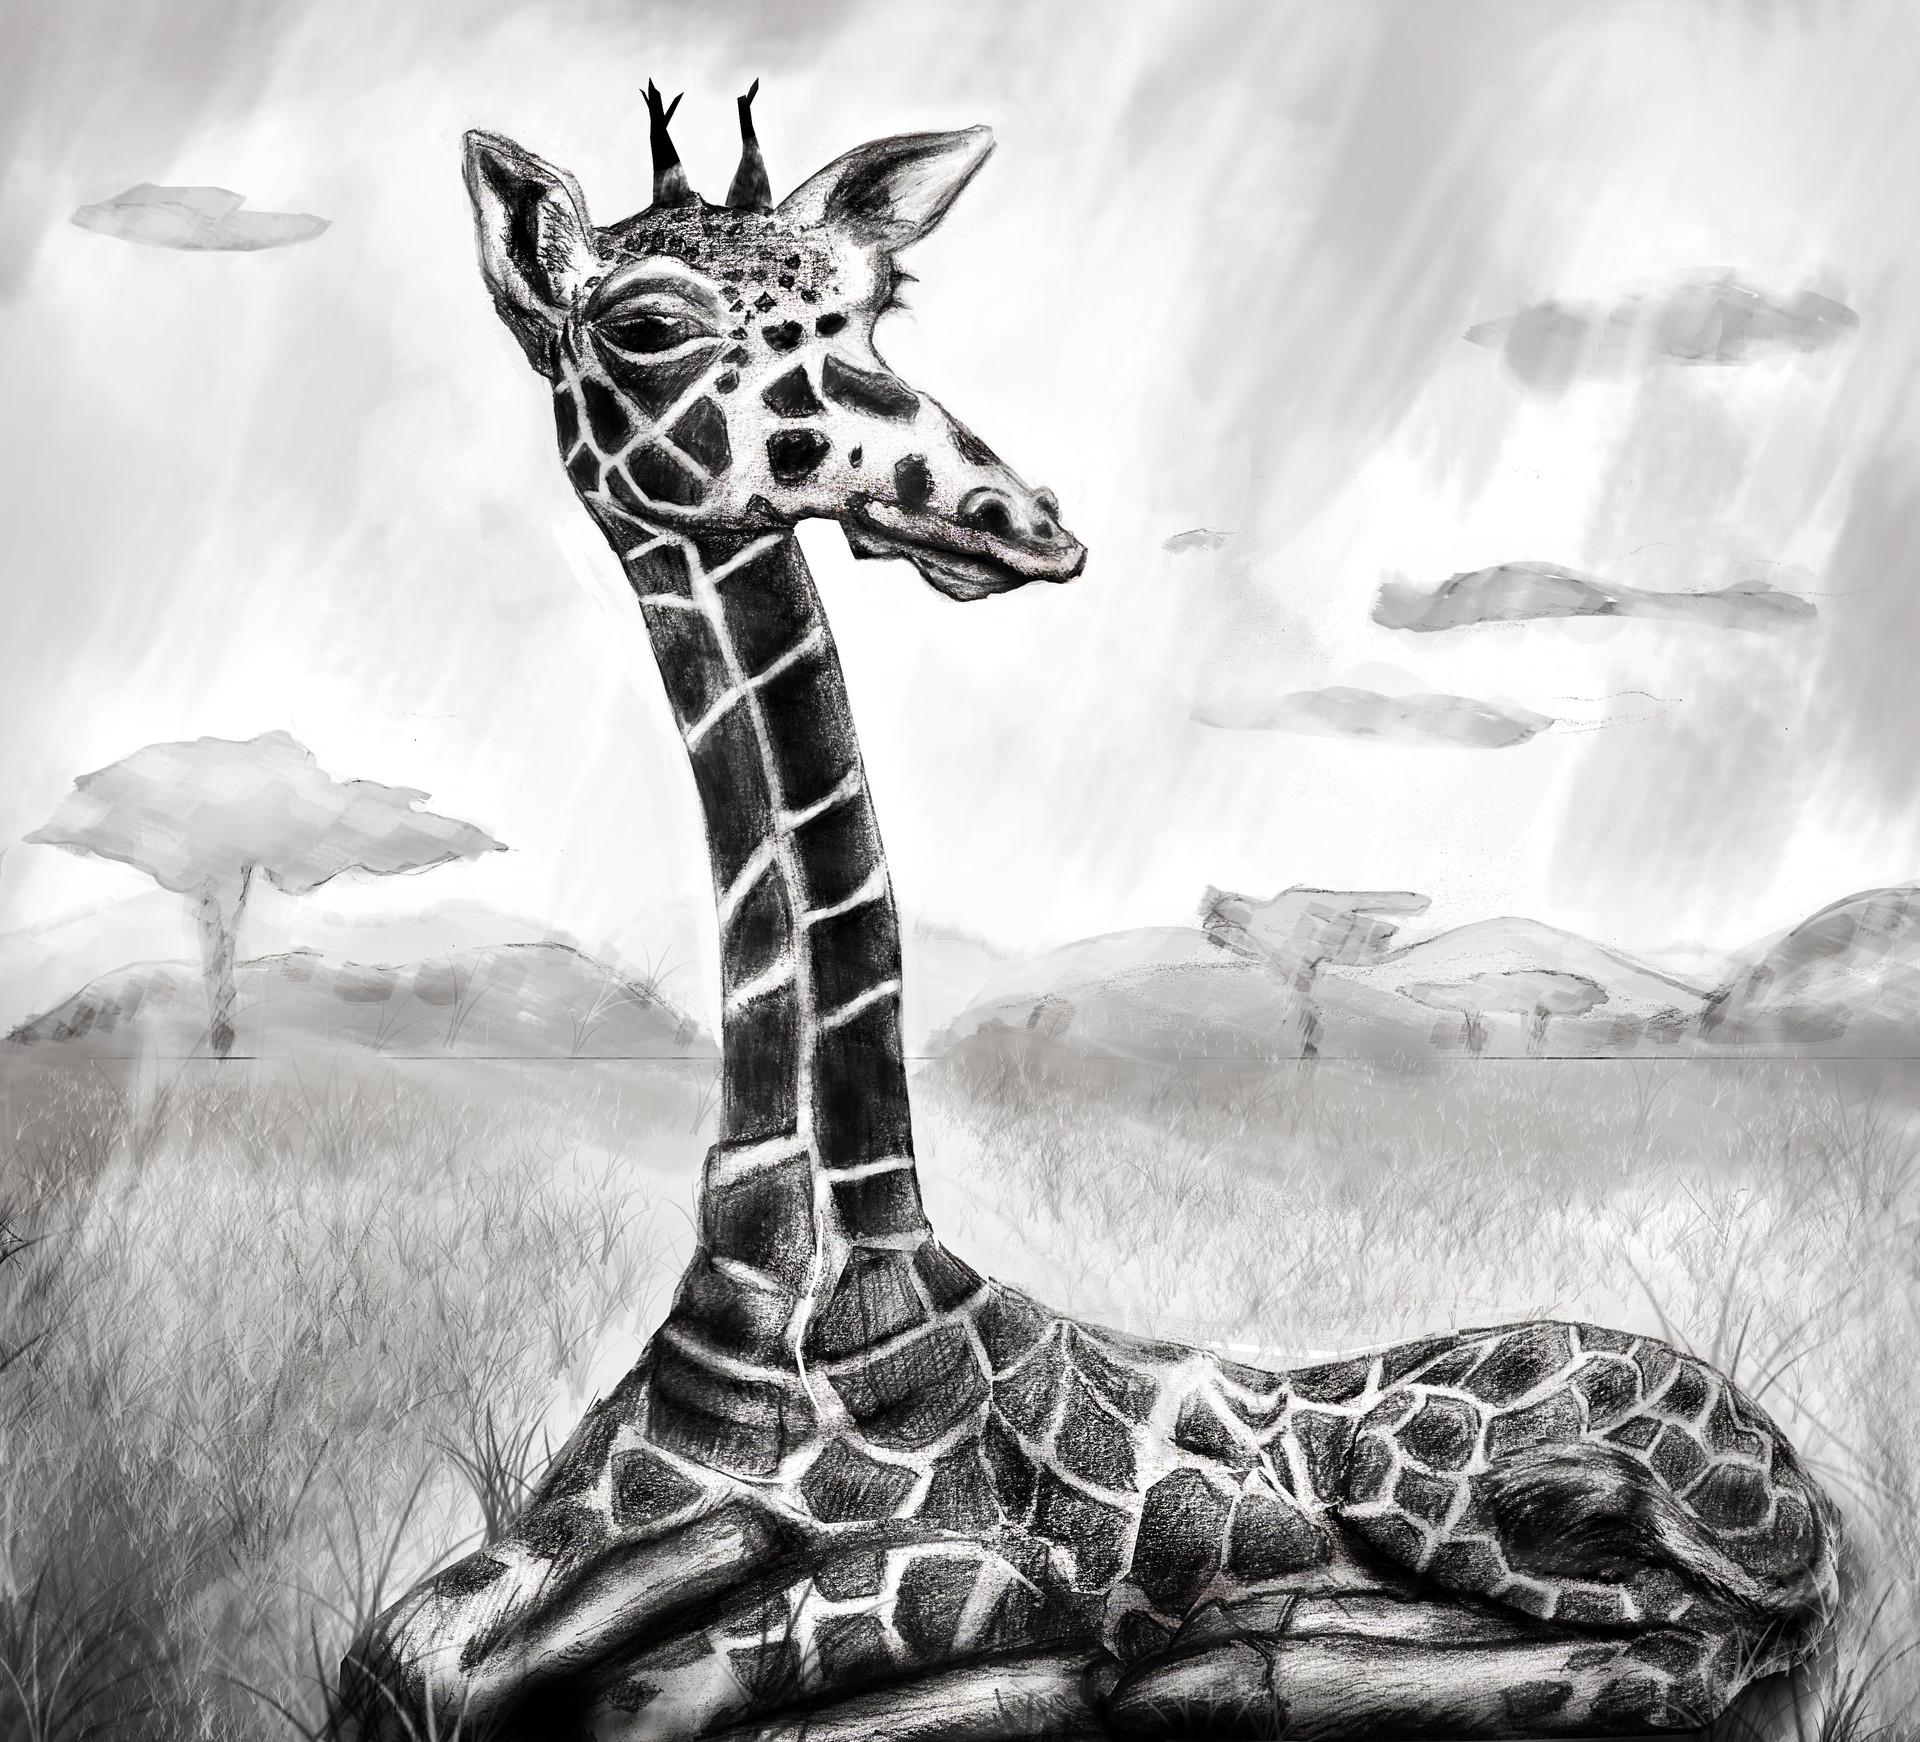 Thomas Fluharty Art Of The Sketch